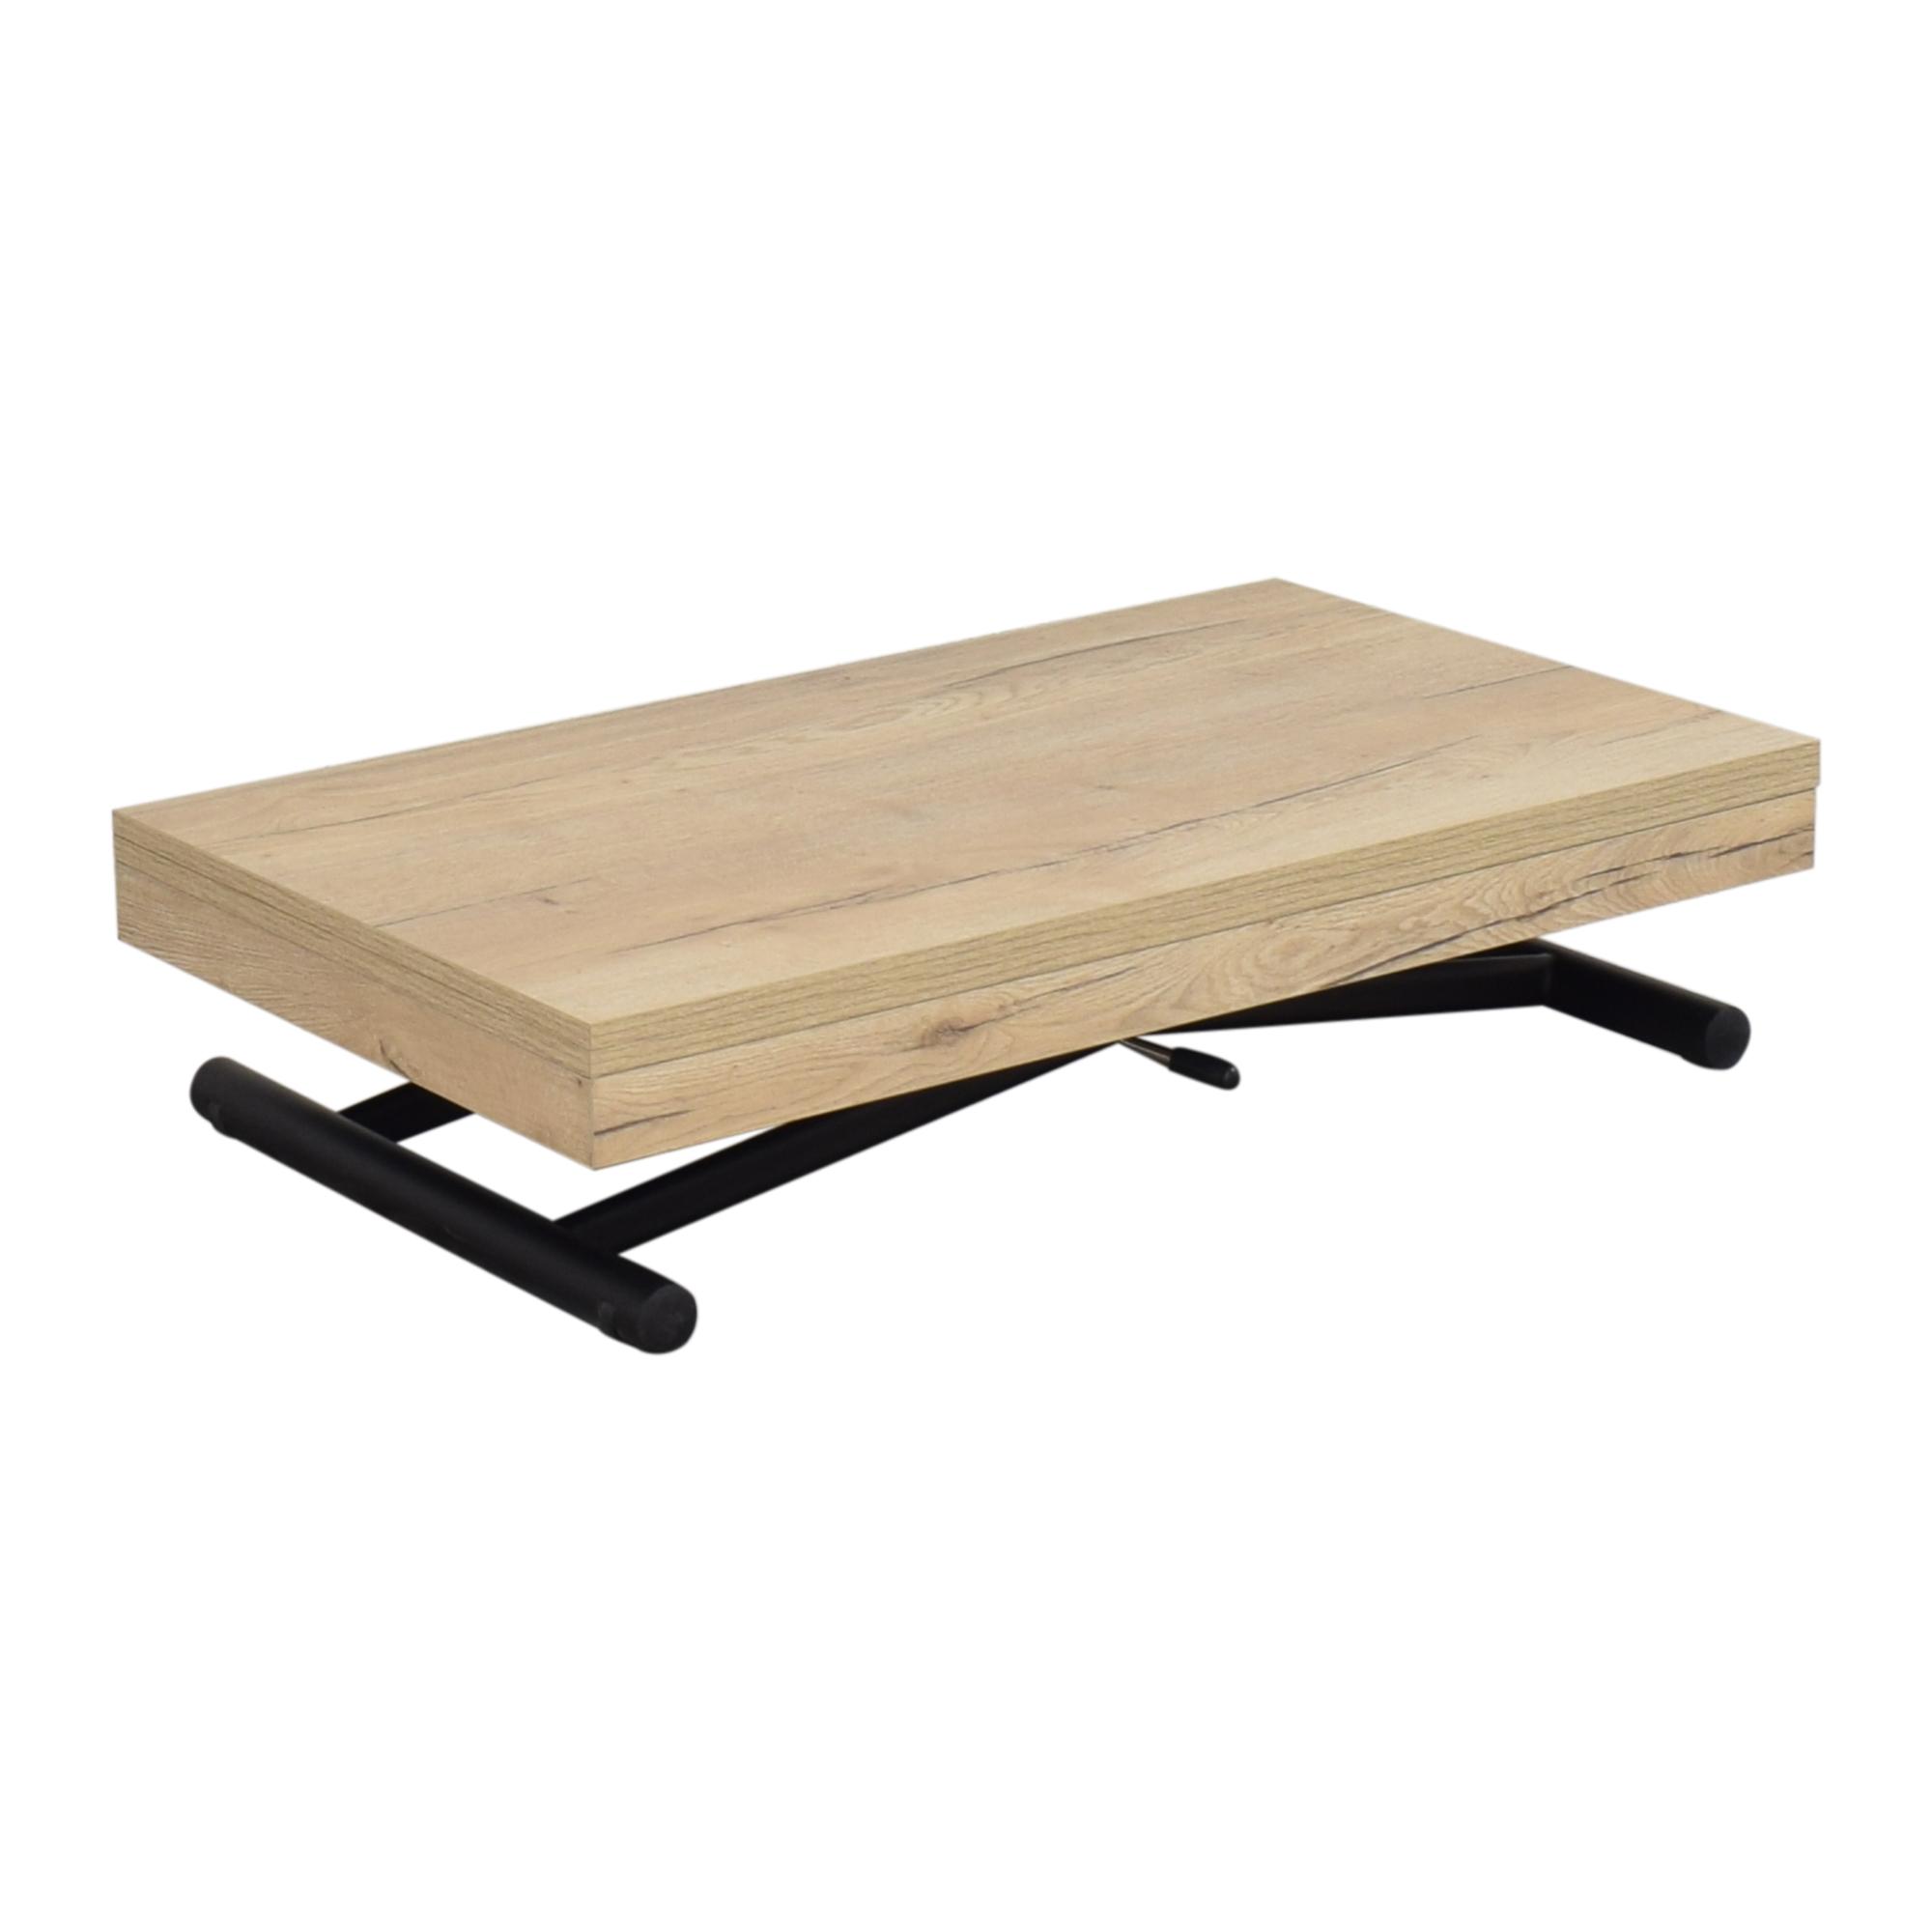 Expand Furniture Expand Furniture Alzare Square Transforming Table pa